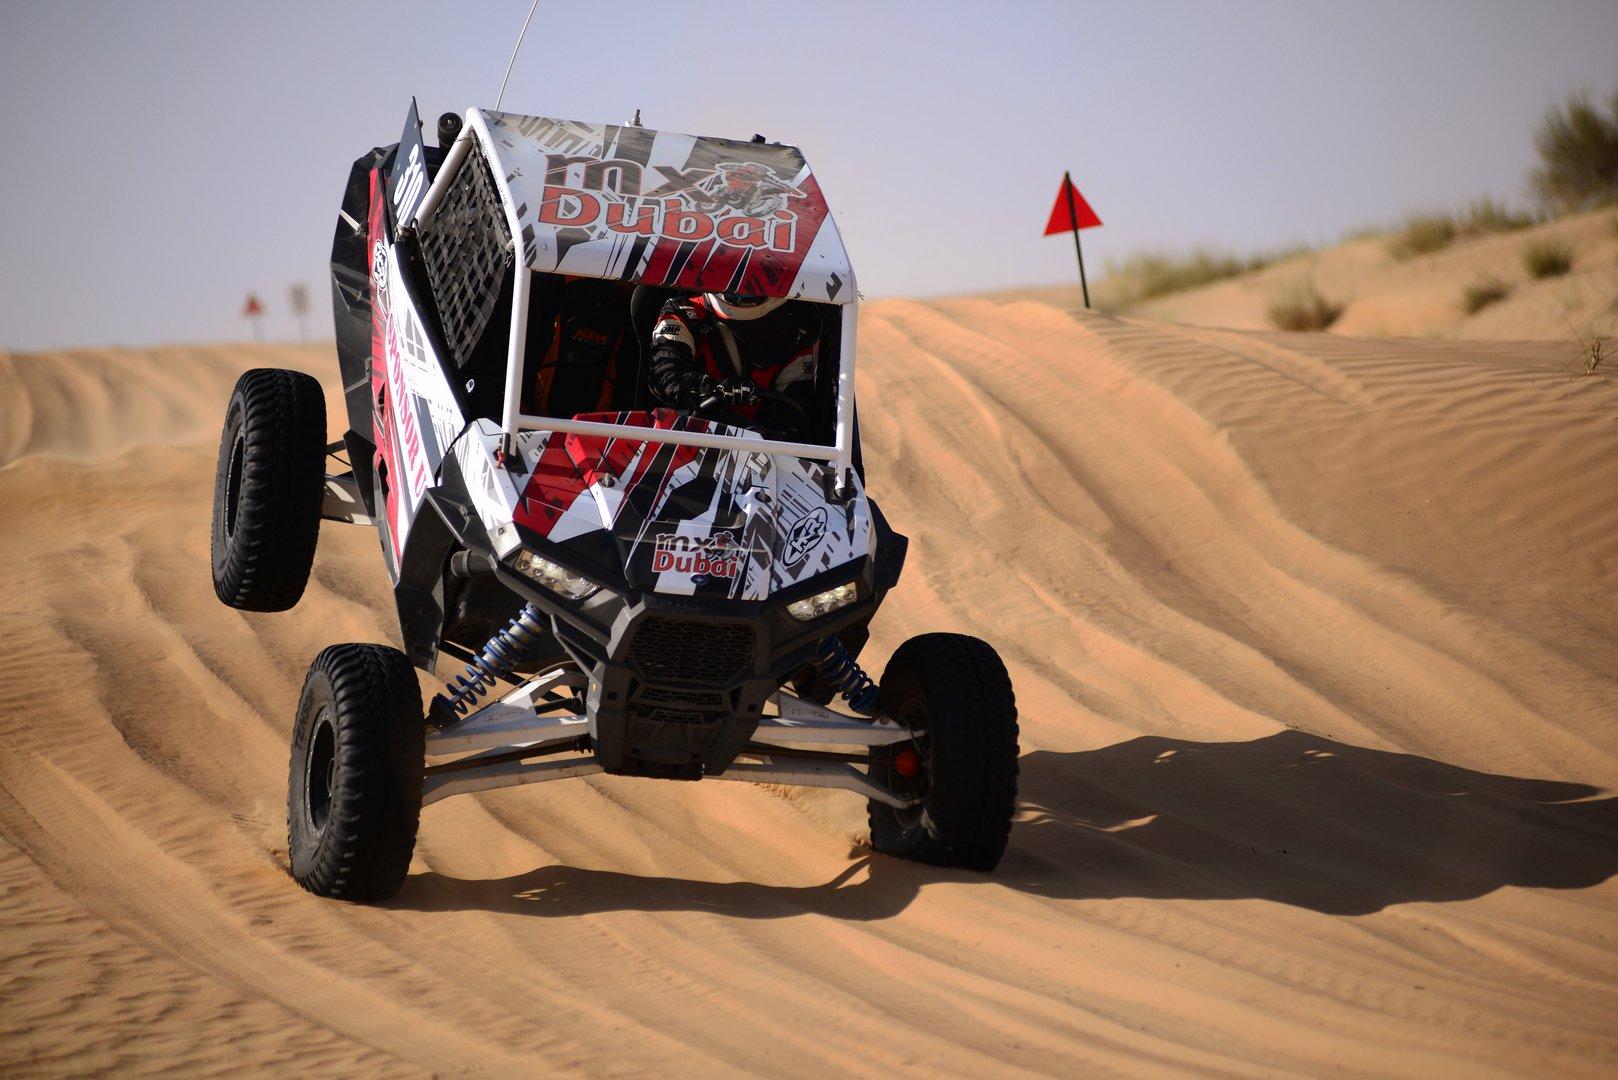 Dubai Emirates Desert Championship Report From Round 2 In